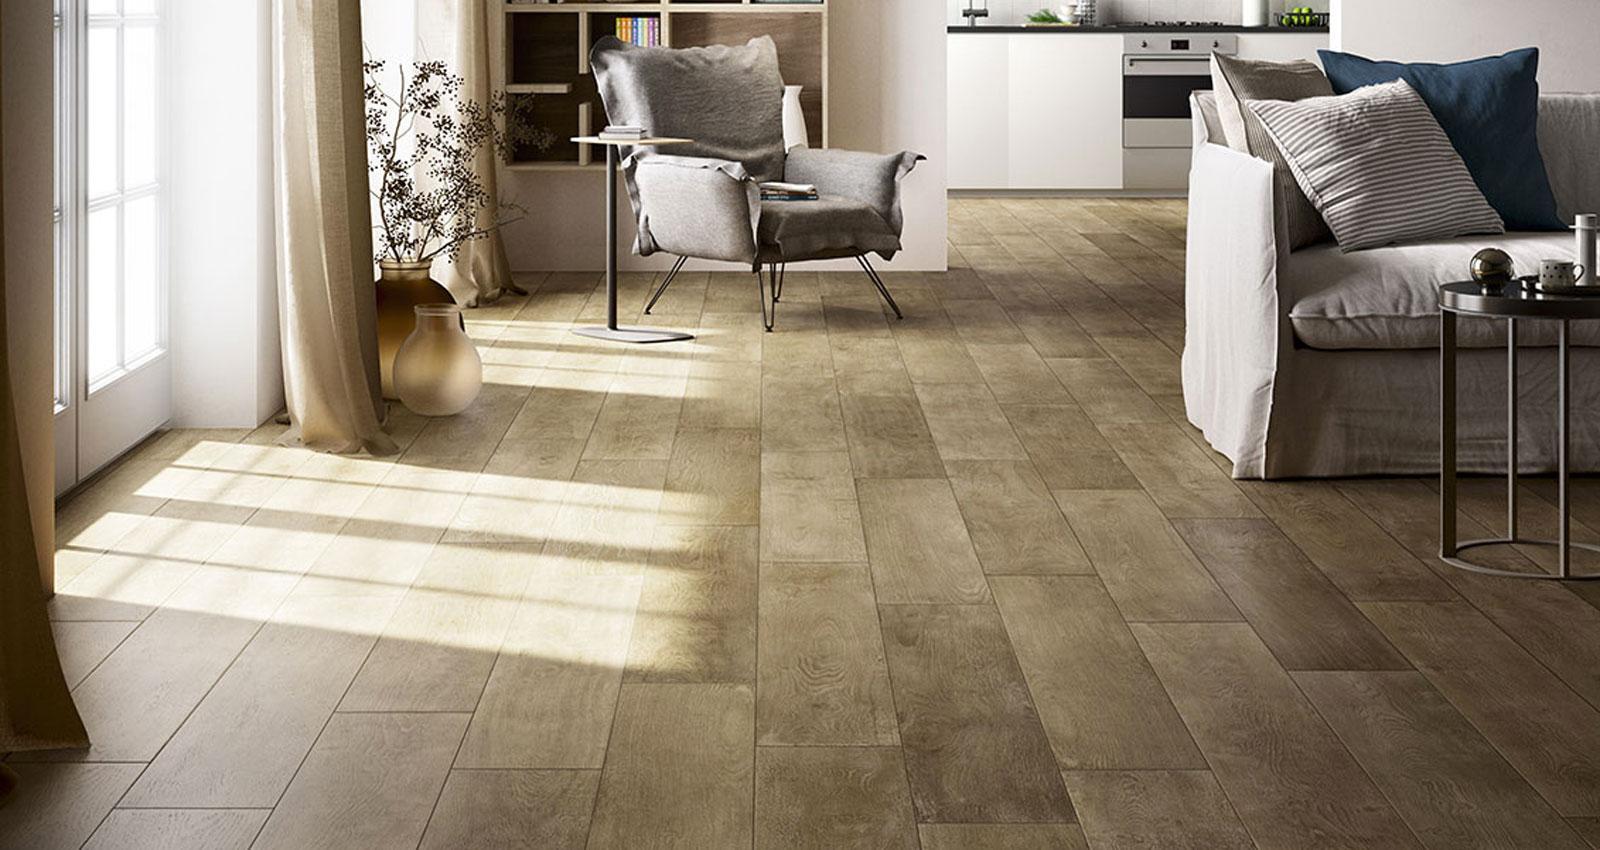 Treverktime gres pavimento effetto legno marazzi for Marazzi carrelage